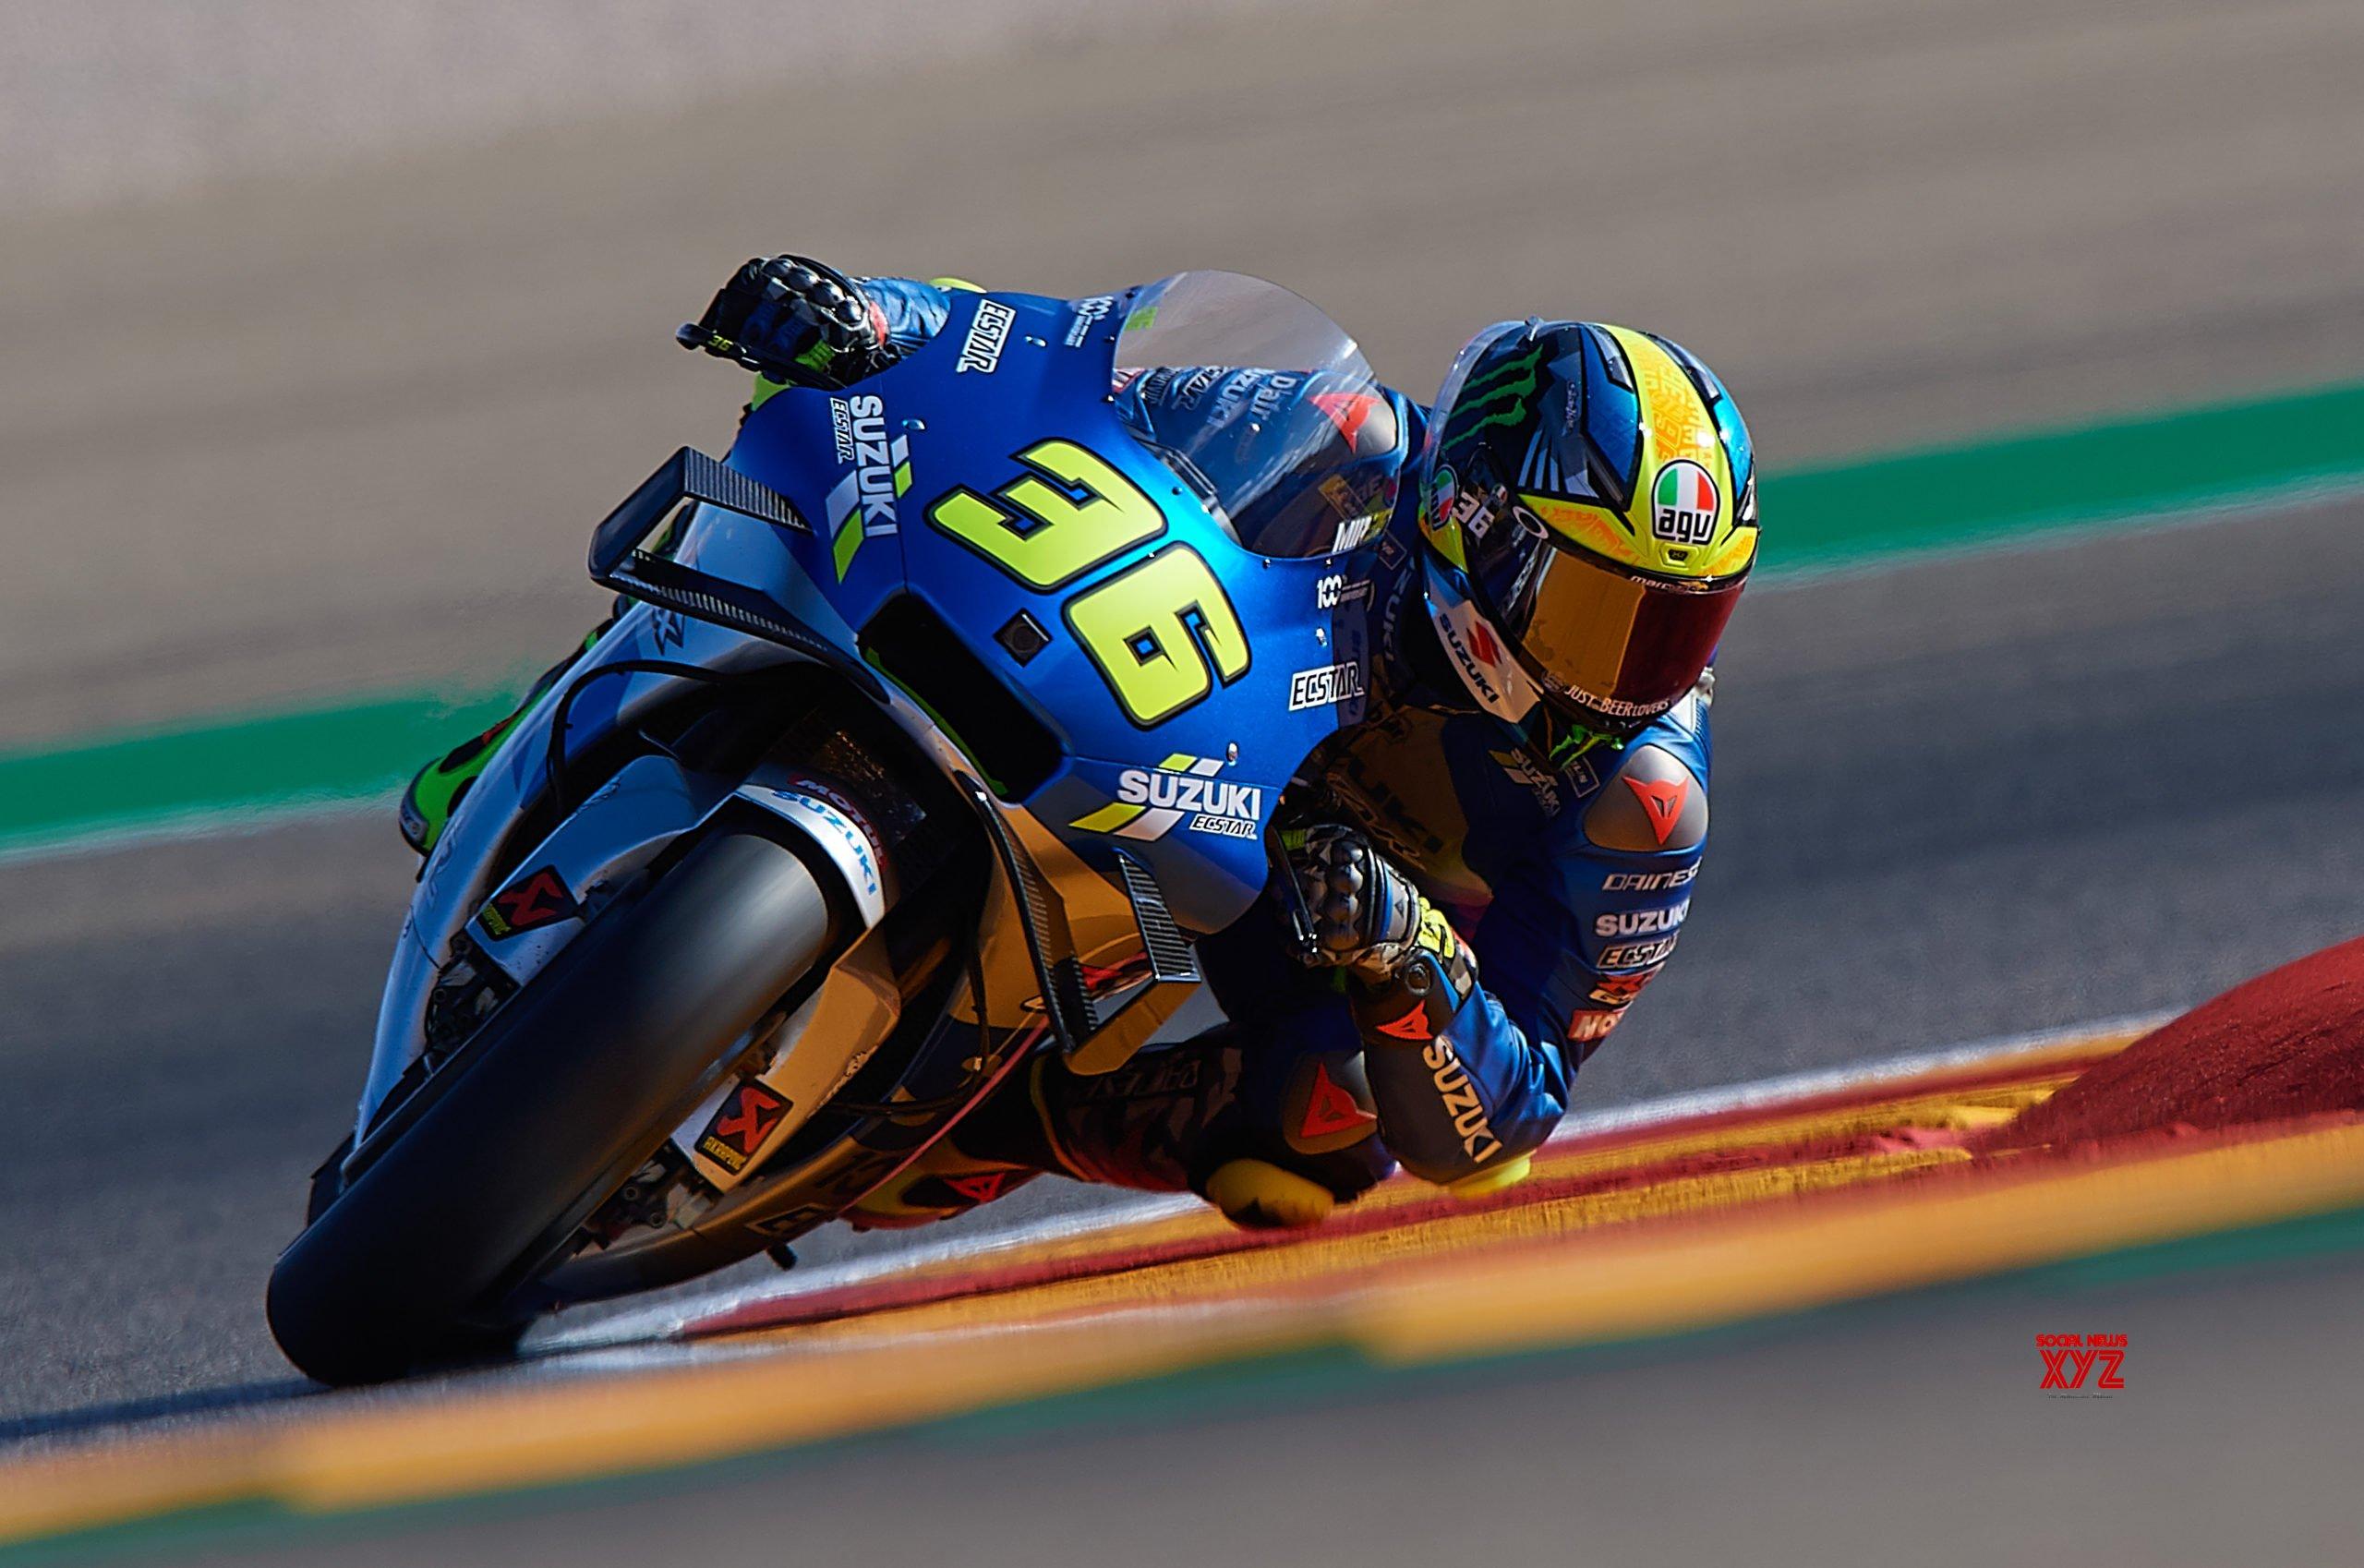 Portuguese MotoGP: Home favourite Oliveira takes pole